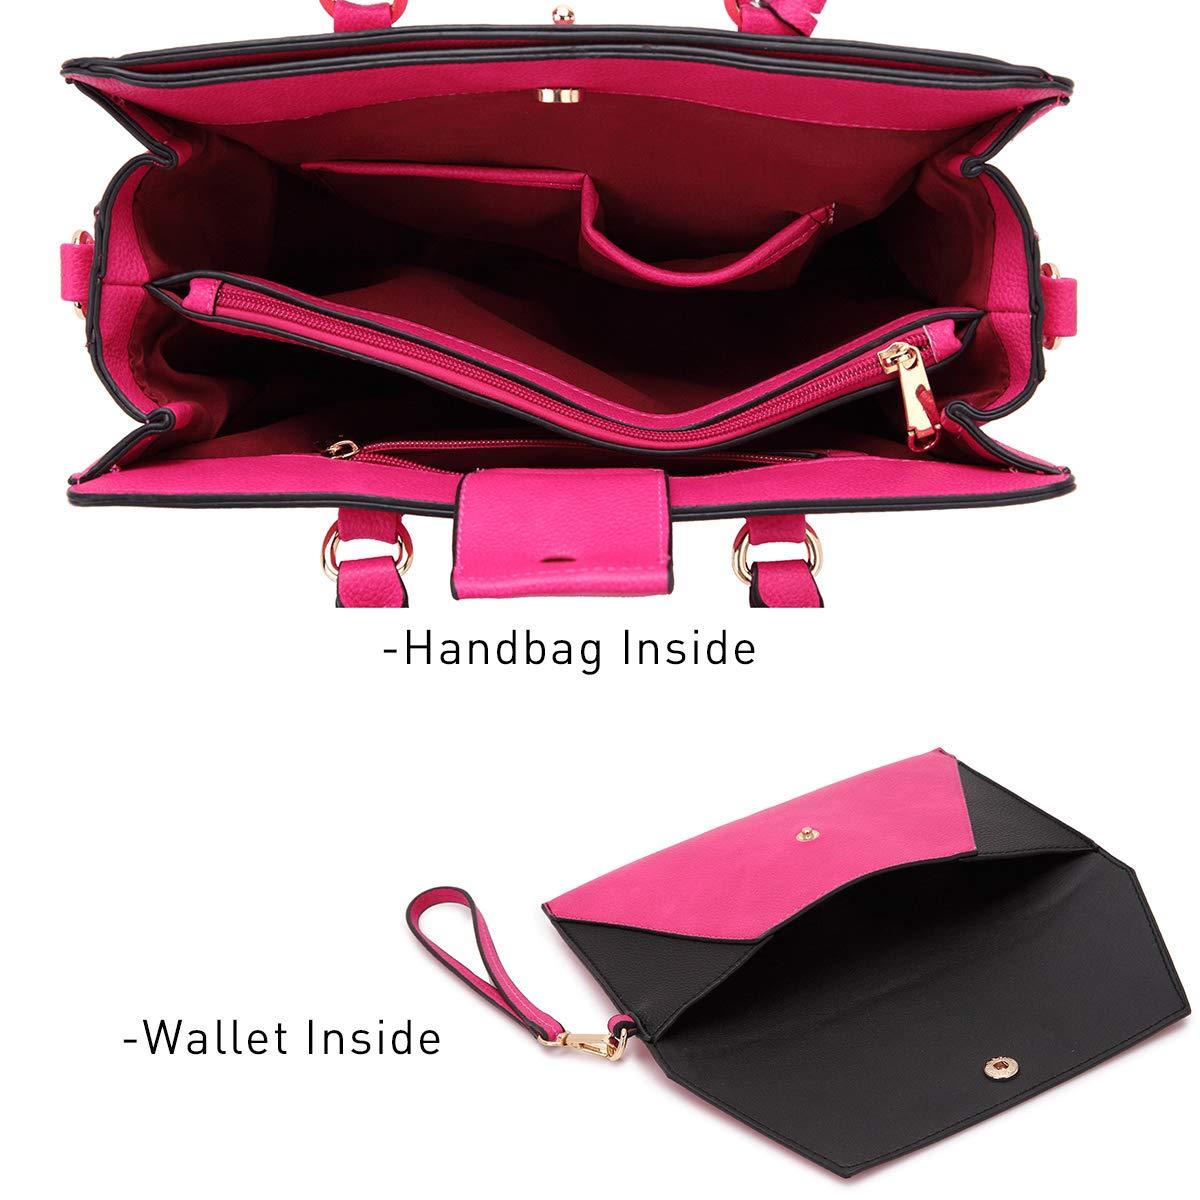 Women's Fashion Handbags Tote Purses Shoulder Bags Top Handle Satchel Purse Set 2pcs 01- Fuchsia by Dasein (Image #3)